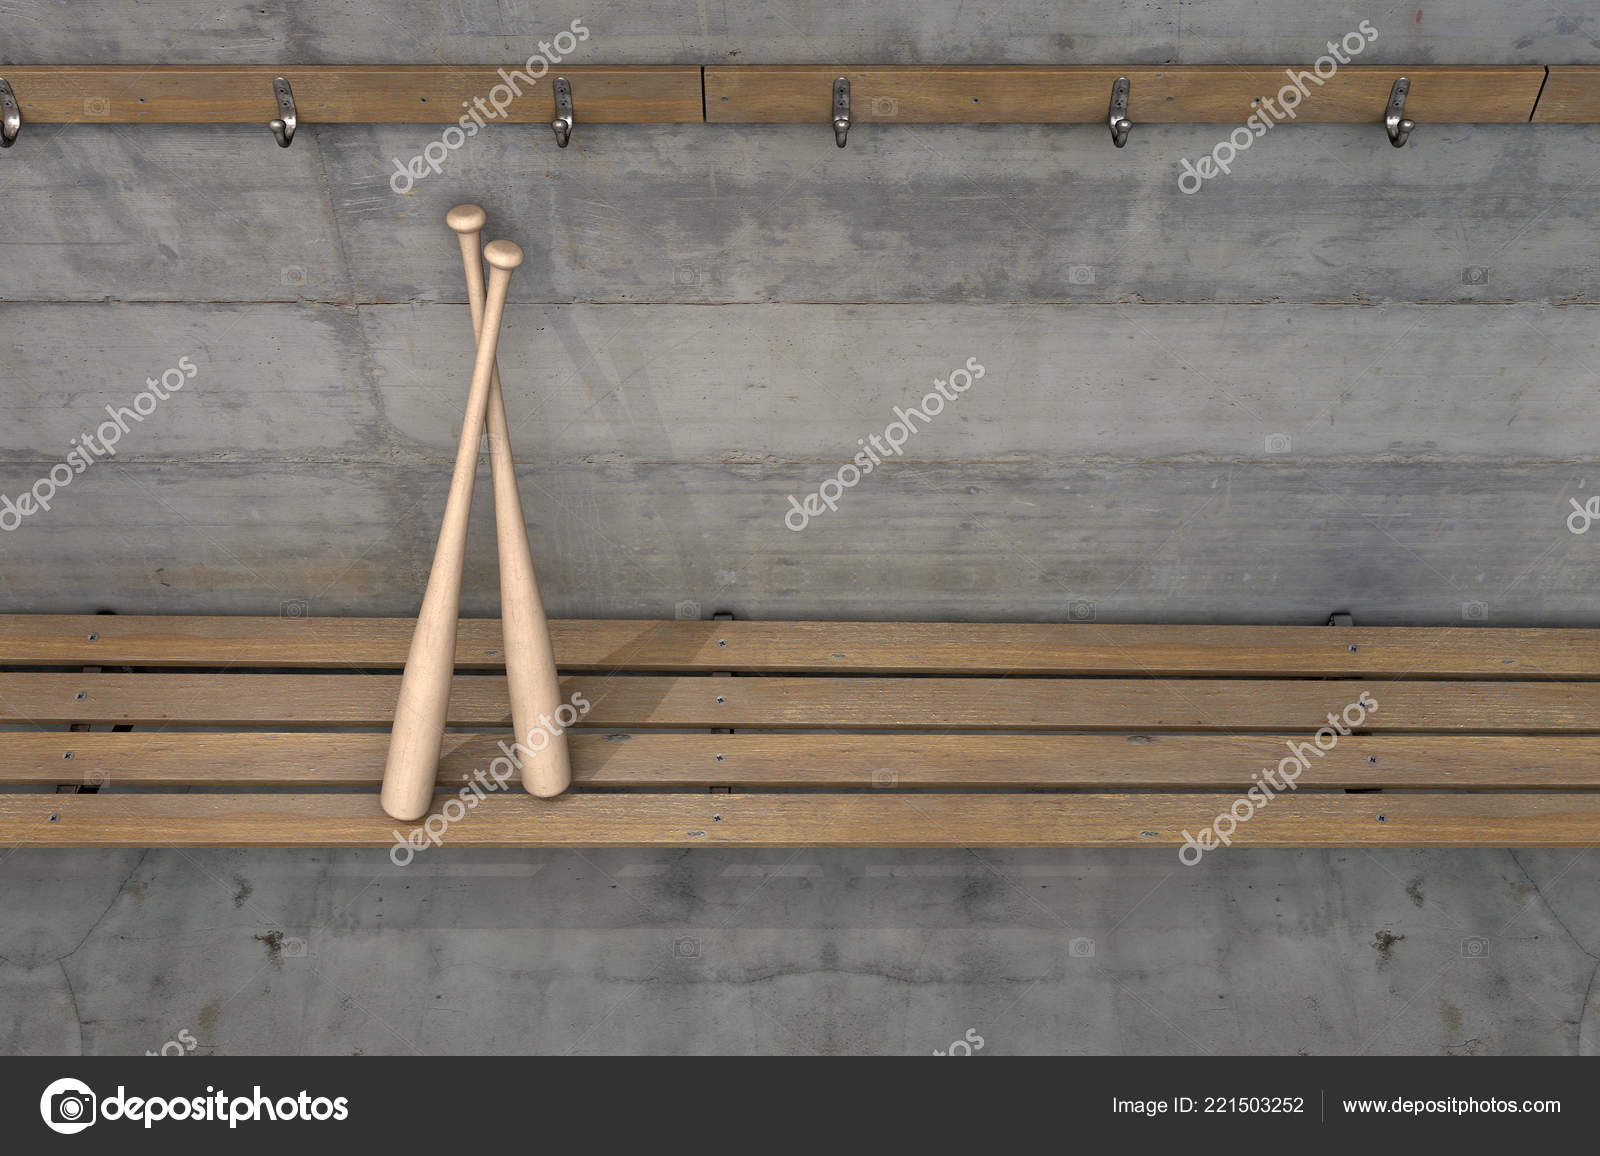 Stupendous Two Baseball Bats Wooden Bench Rundown Sports Locker Change Beatyapartments Chair Design Images Beatyapartmentscom